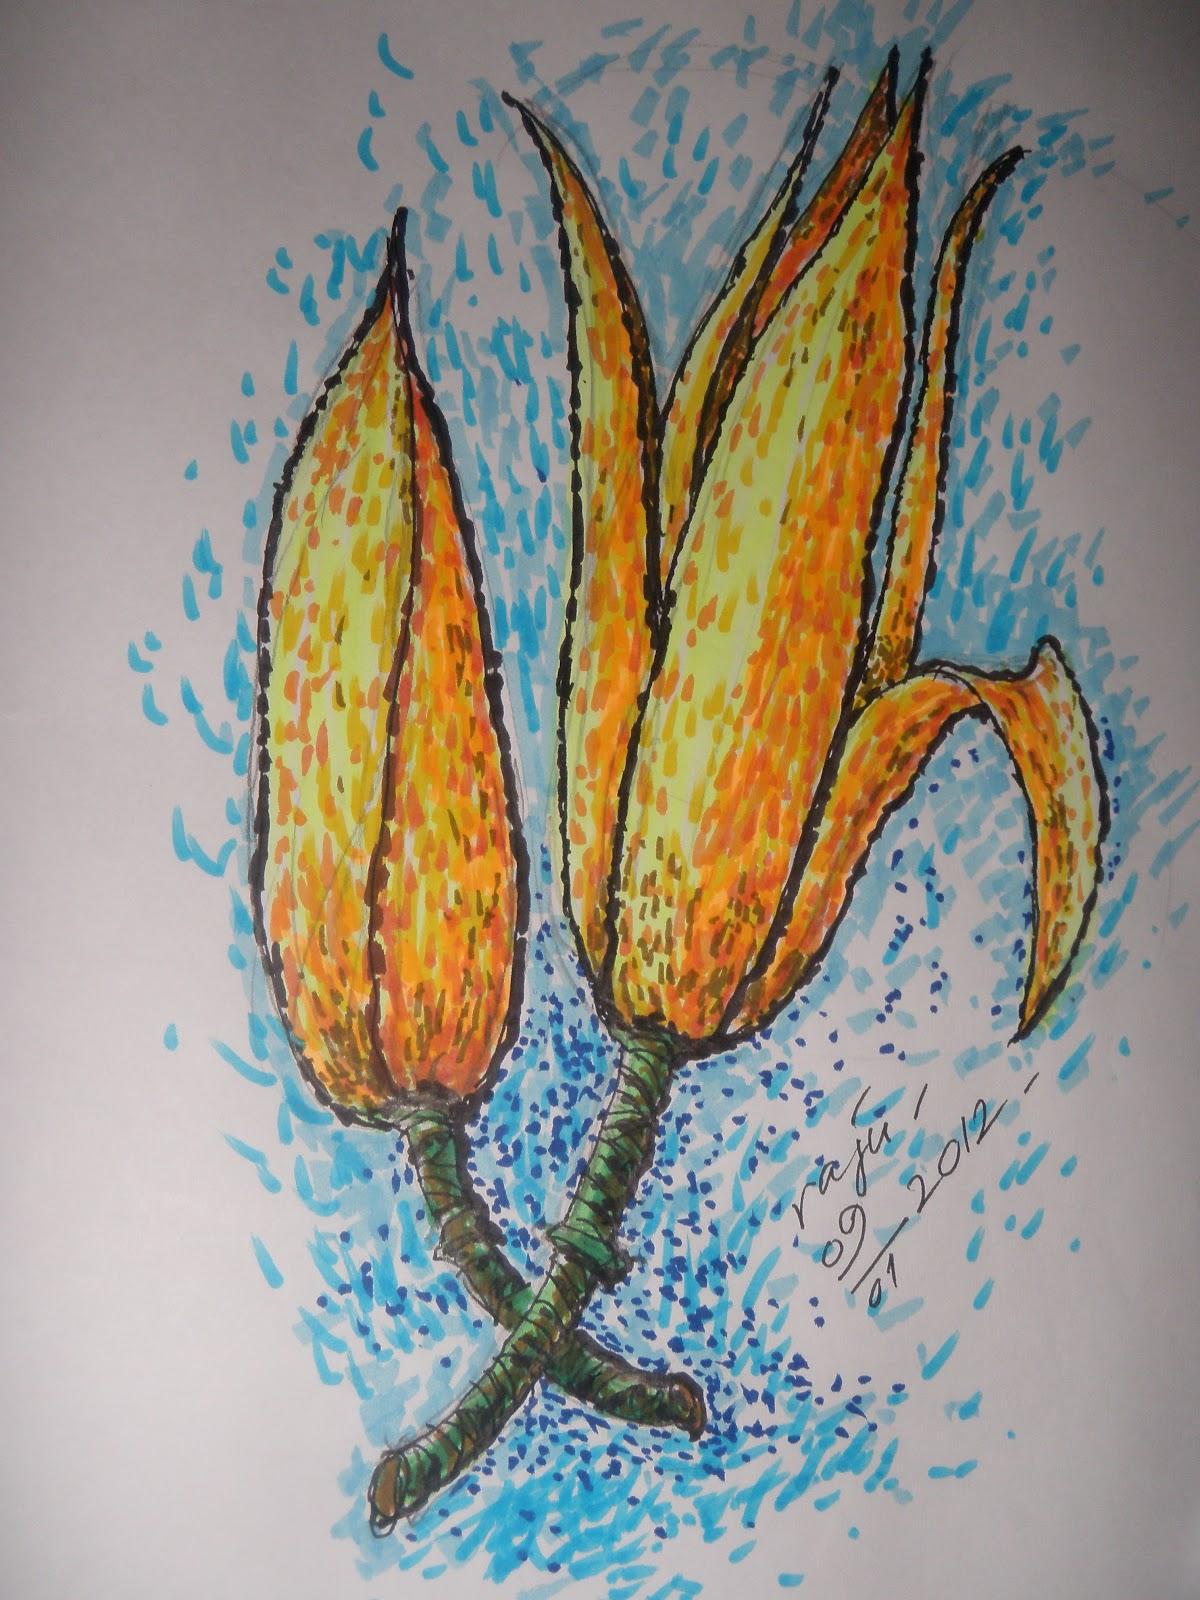 Sketsa Gambar Bunga Cempaka Gambar Bunga